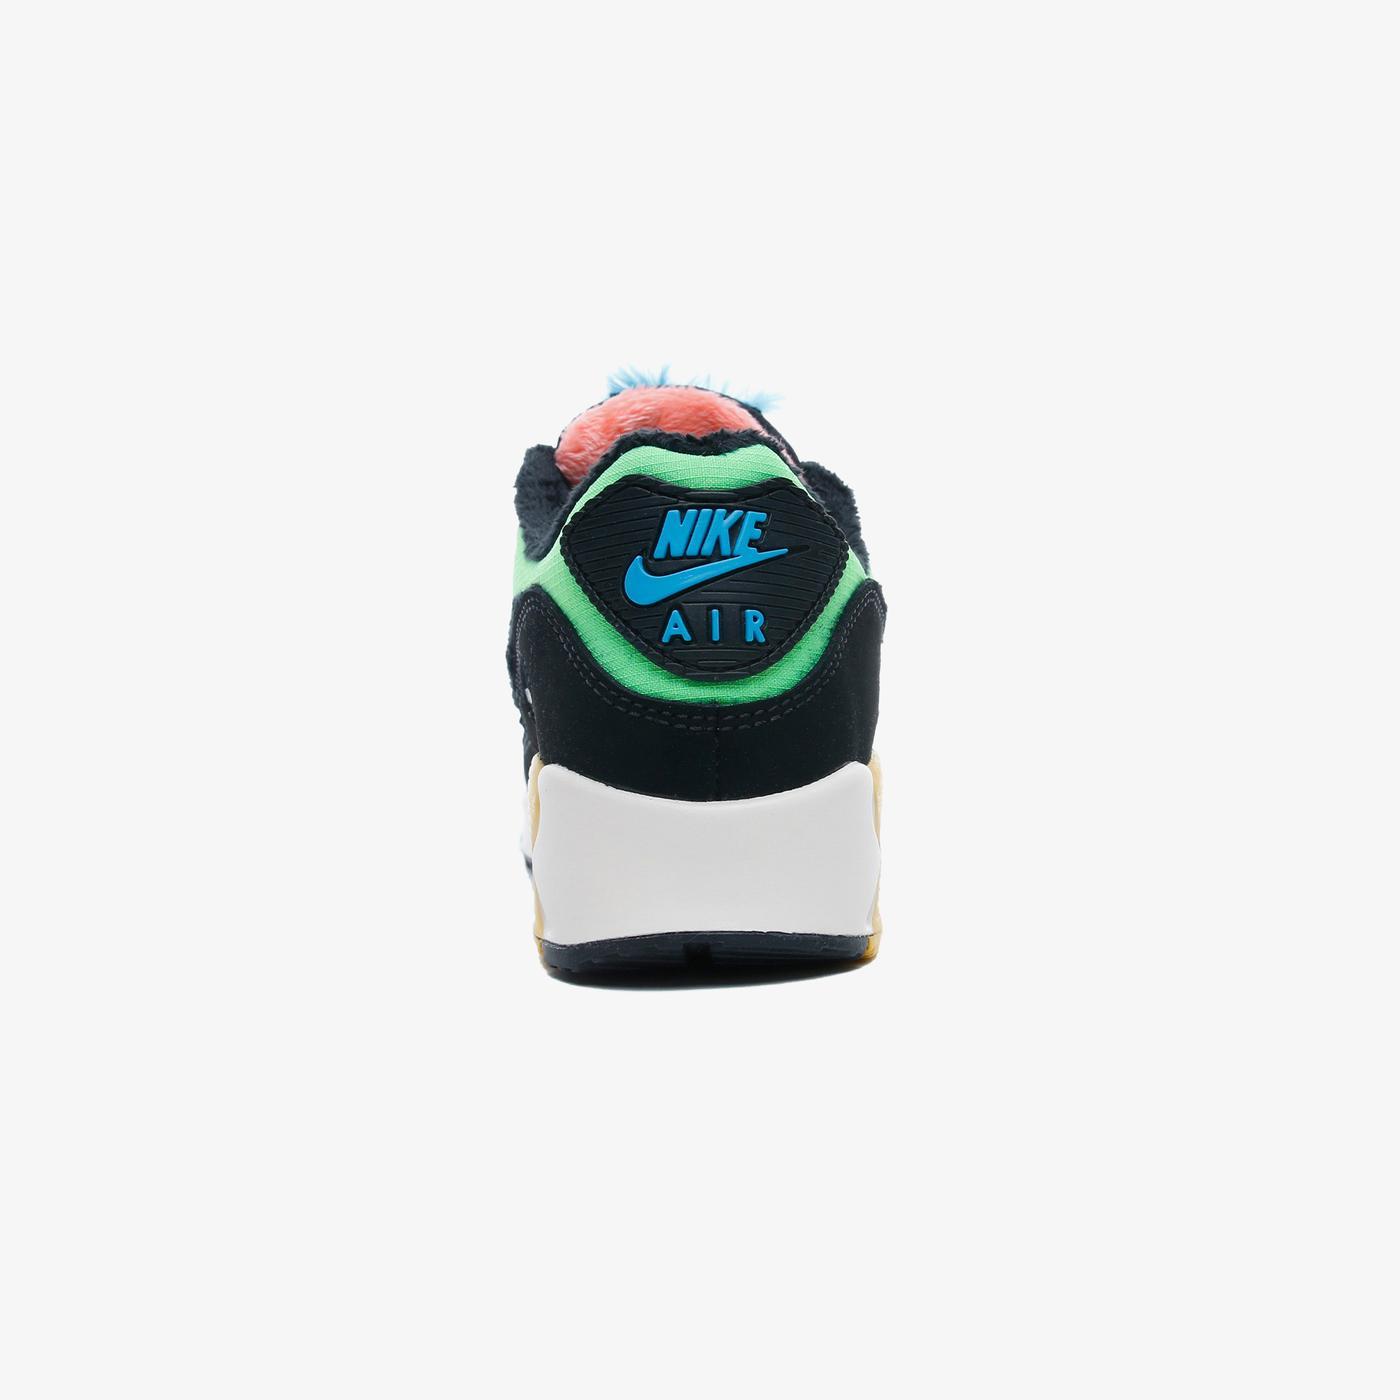 Nike Air Max 90 Premium Kadın Siyah Spor Ayakkabı